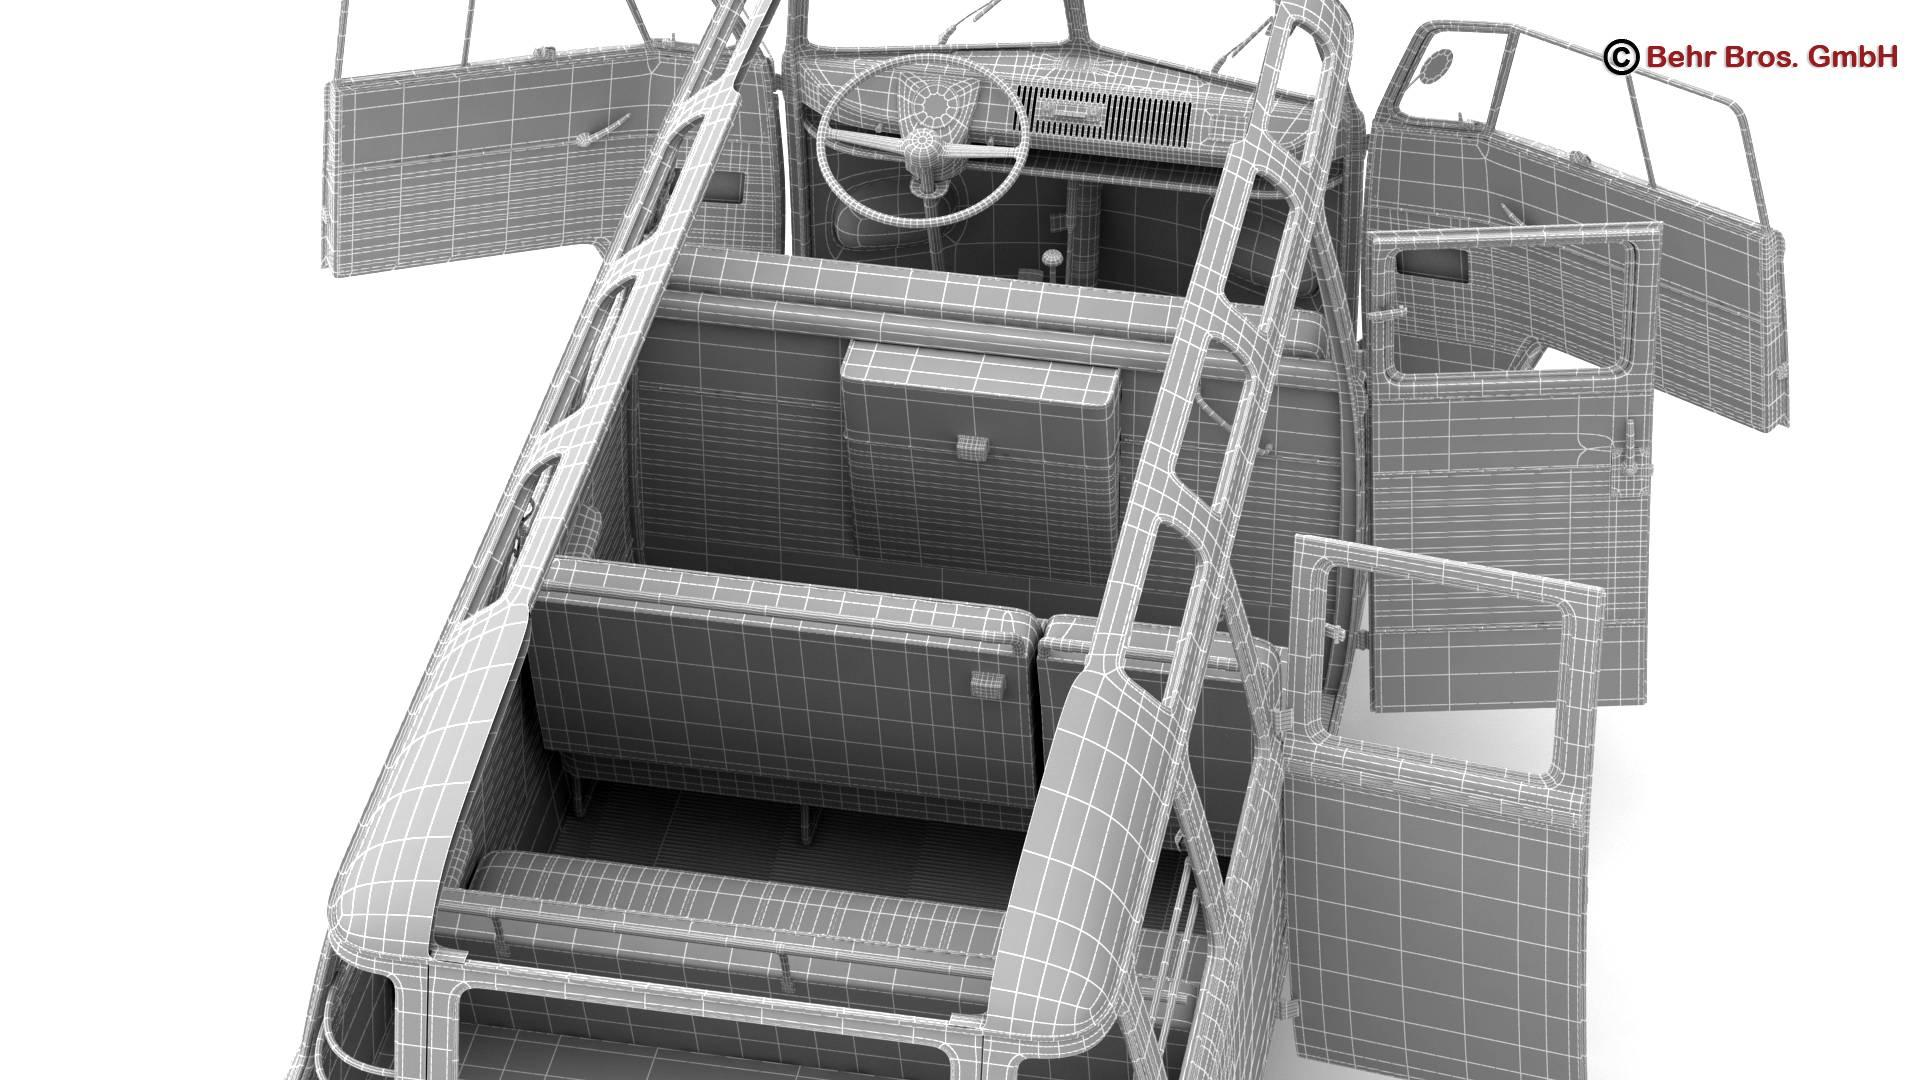 volkswagen type 2 samba 1959 3d model 3ds max fbx c4d lwo ma mb obj 217133